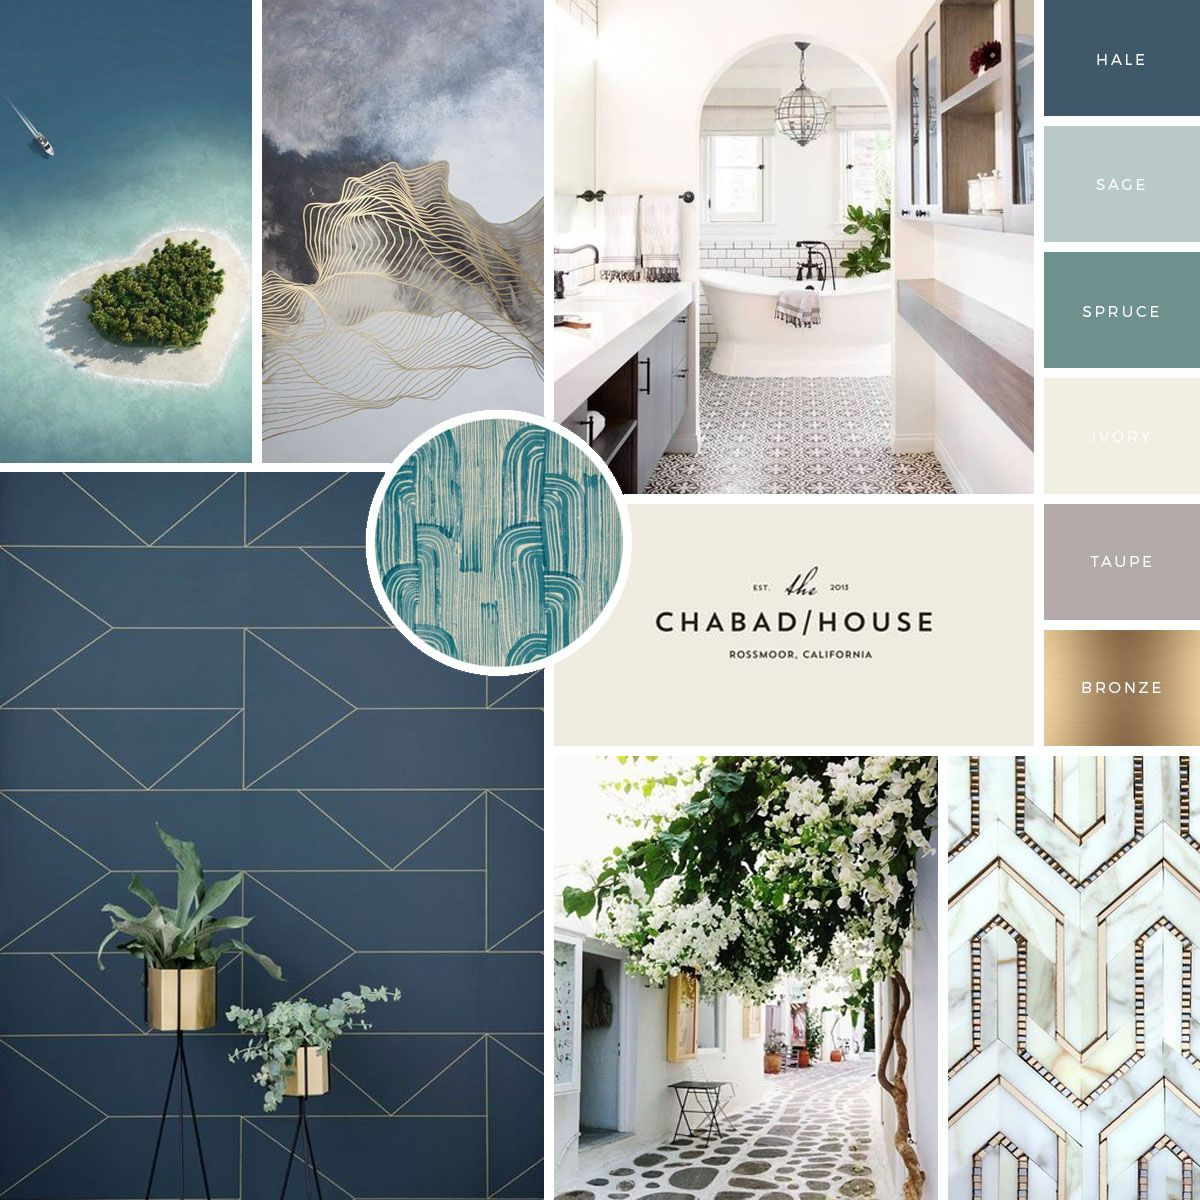 Portfolio With Images Design Theory